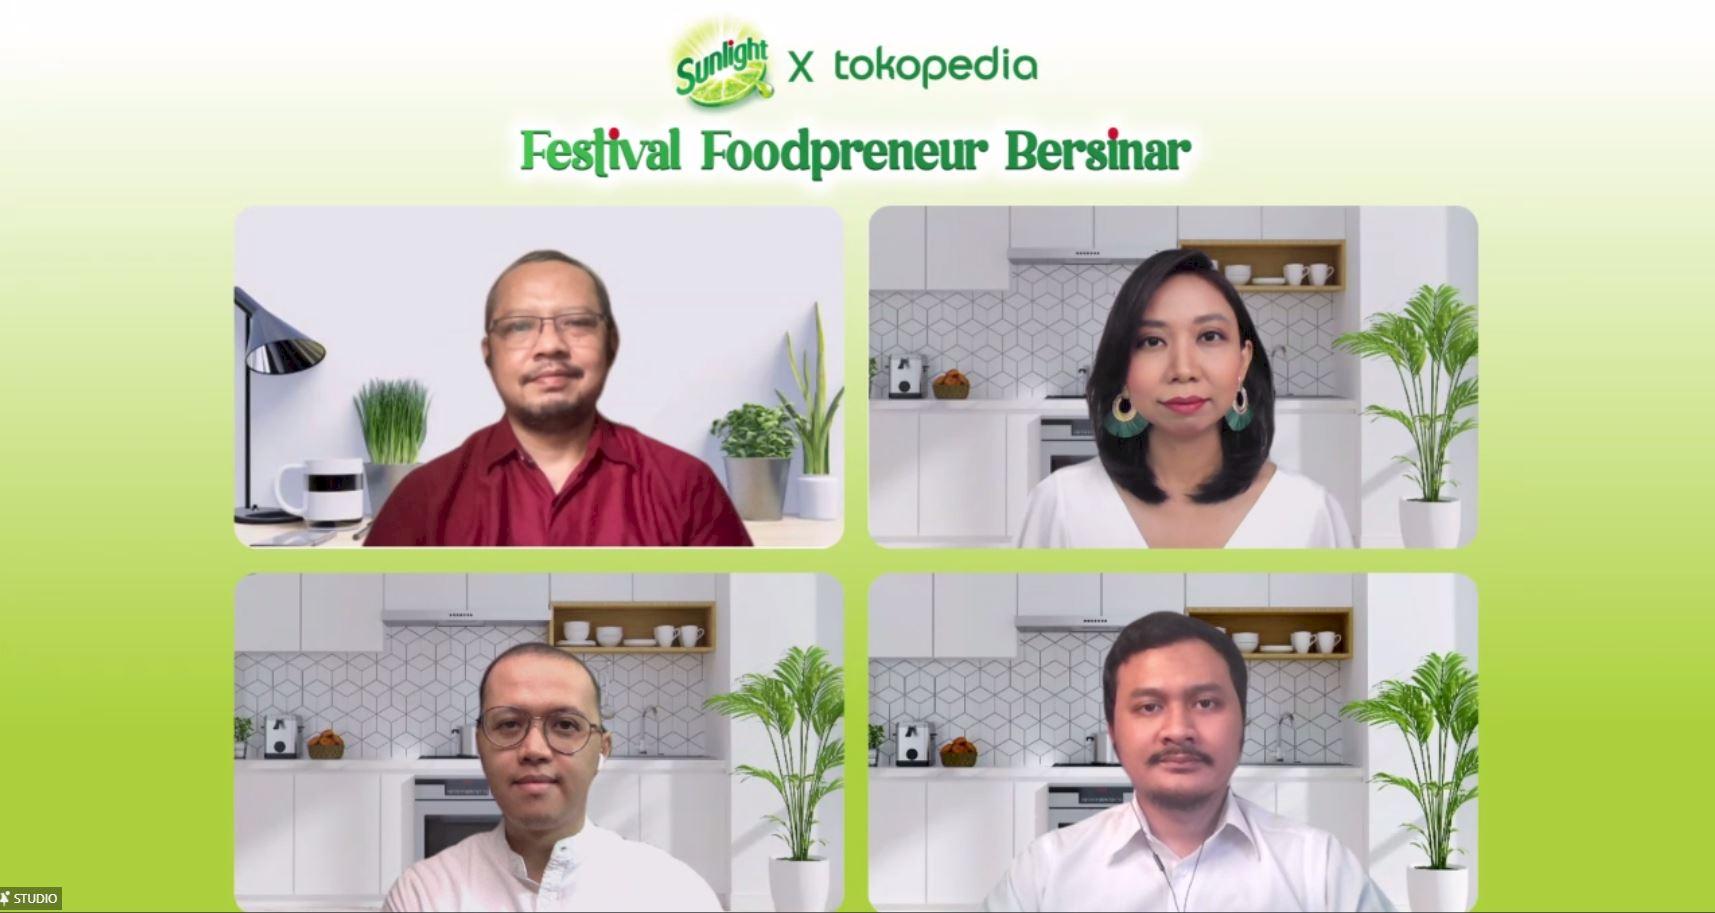 Festival Foodpreuner, Upaya Dukung UMKM Perempuan Indonesia